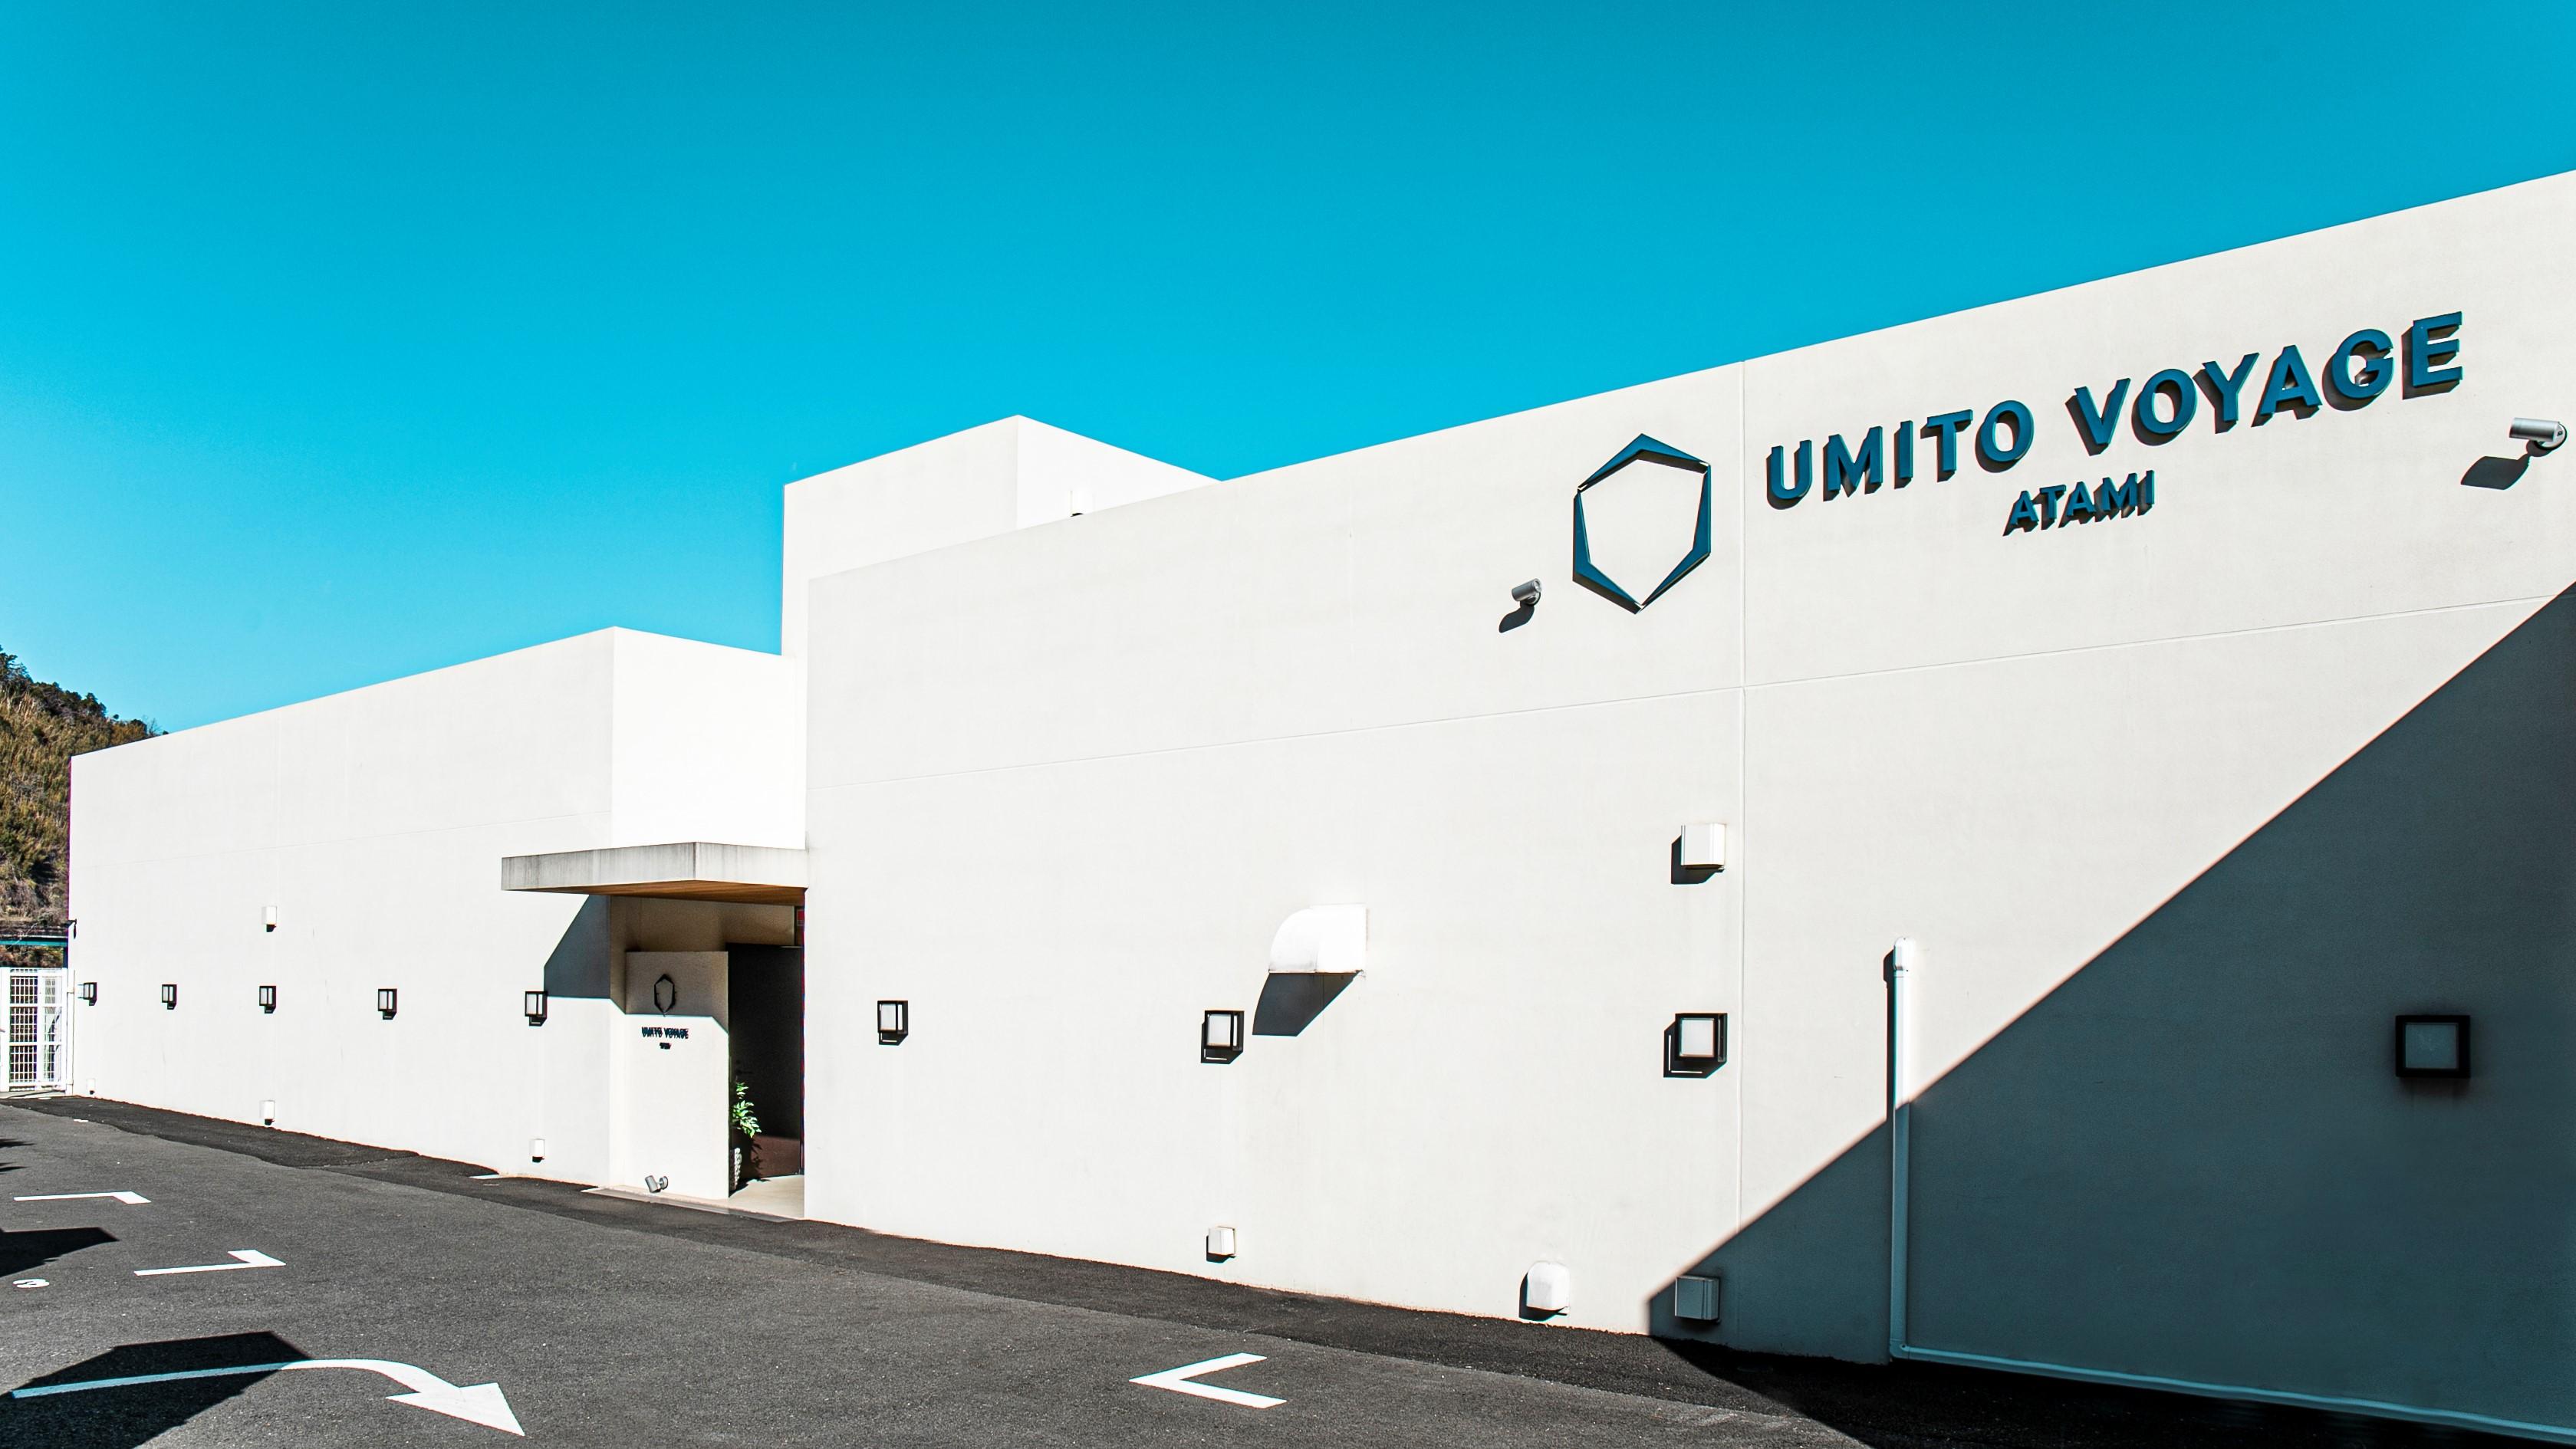 UMITO VOYAGE ATAMIの施設画像